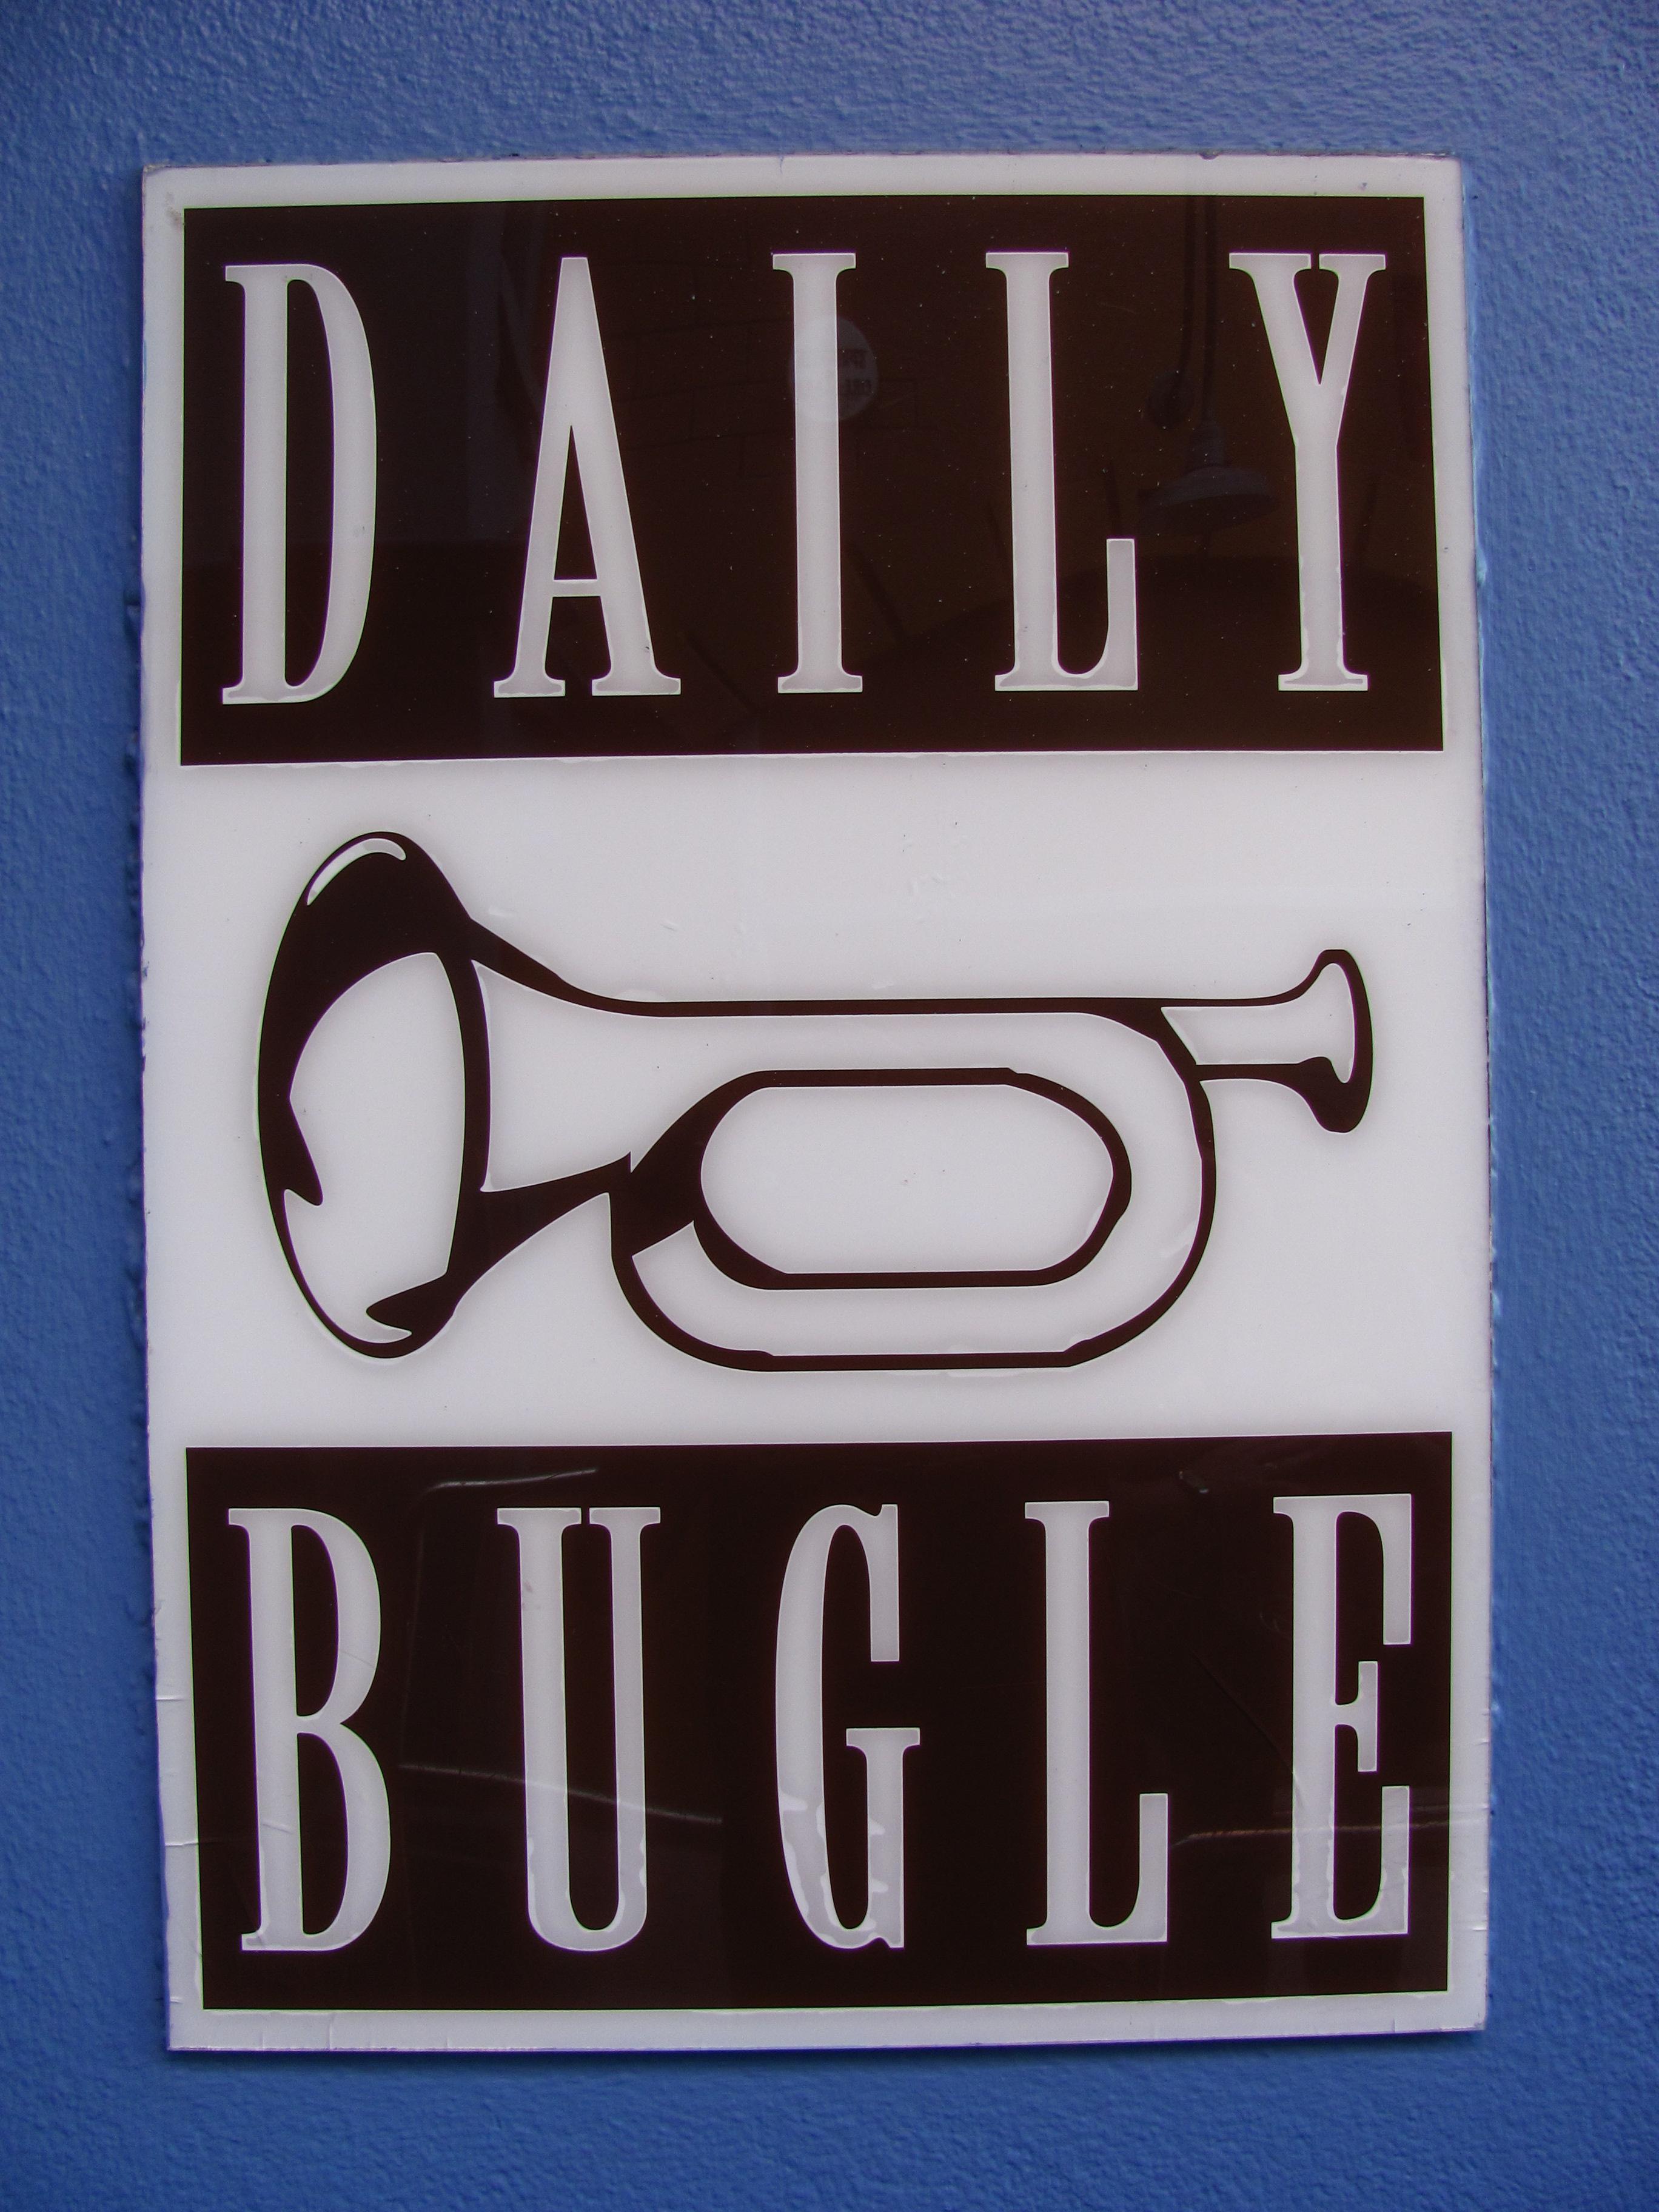 filethe amazing adventures of spiderman daily buglejpg